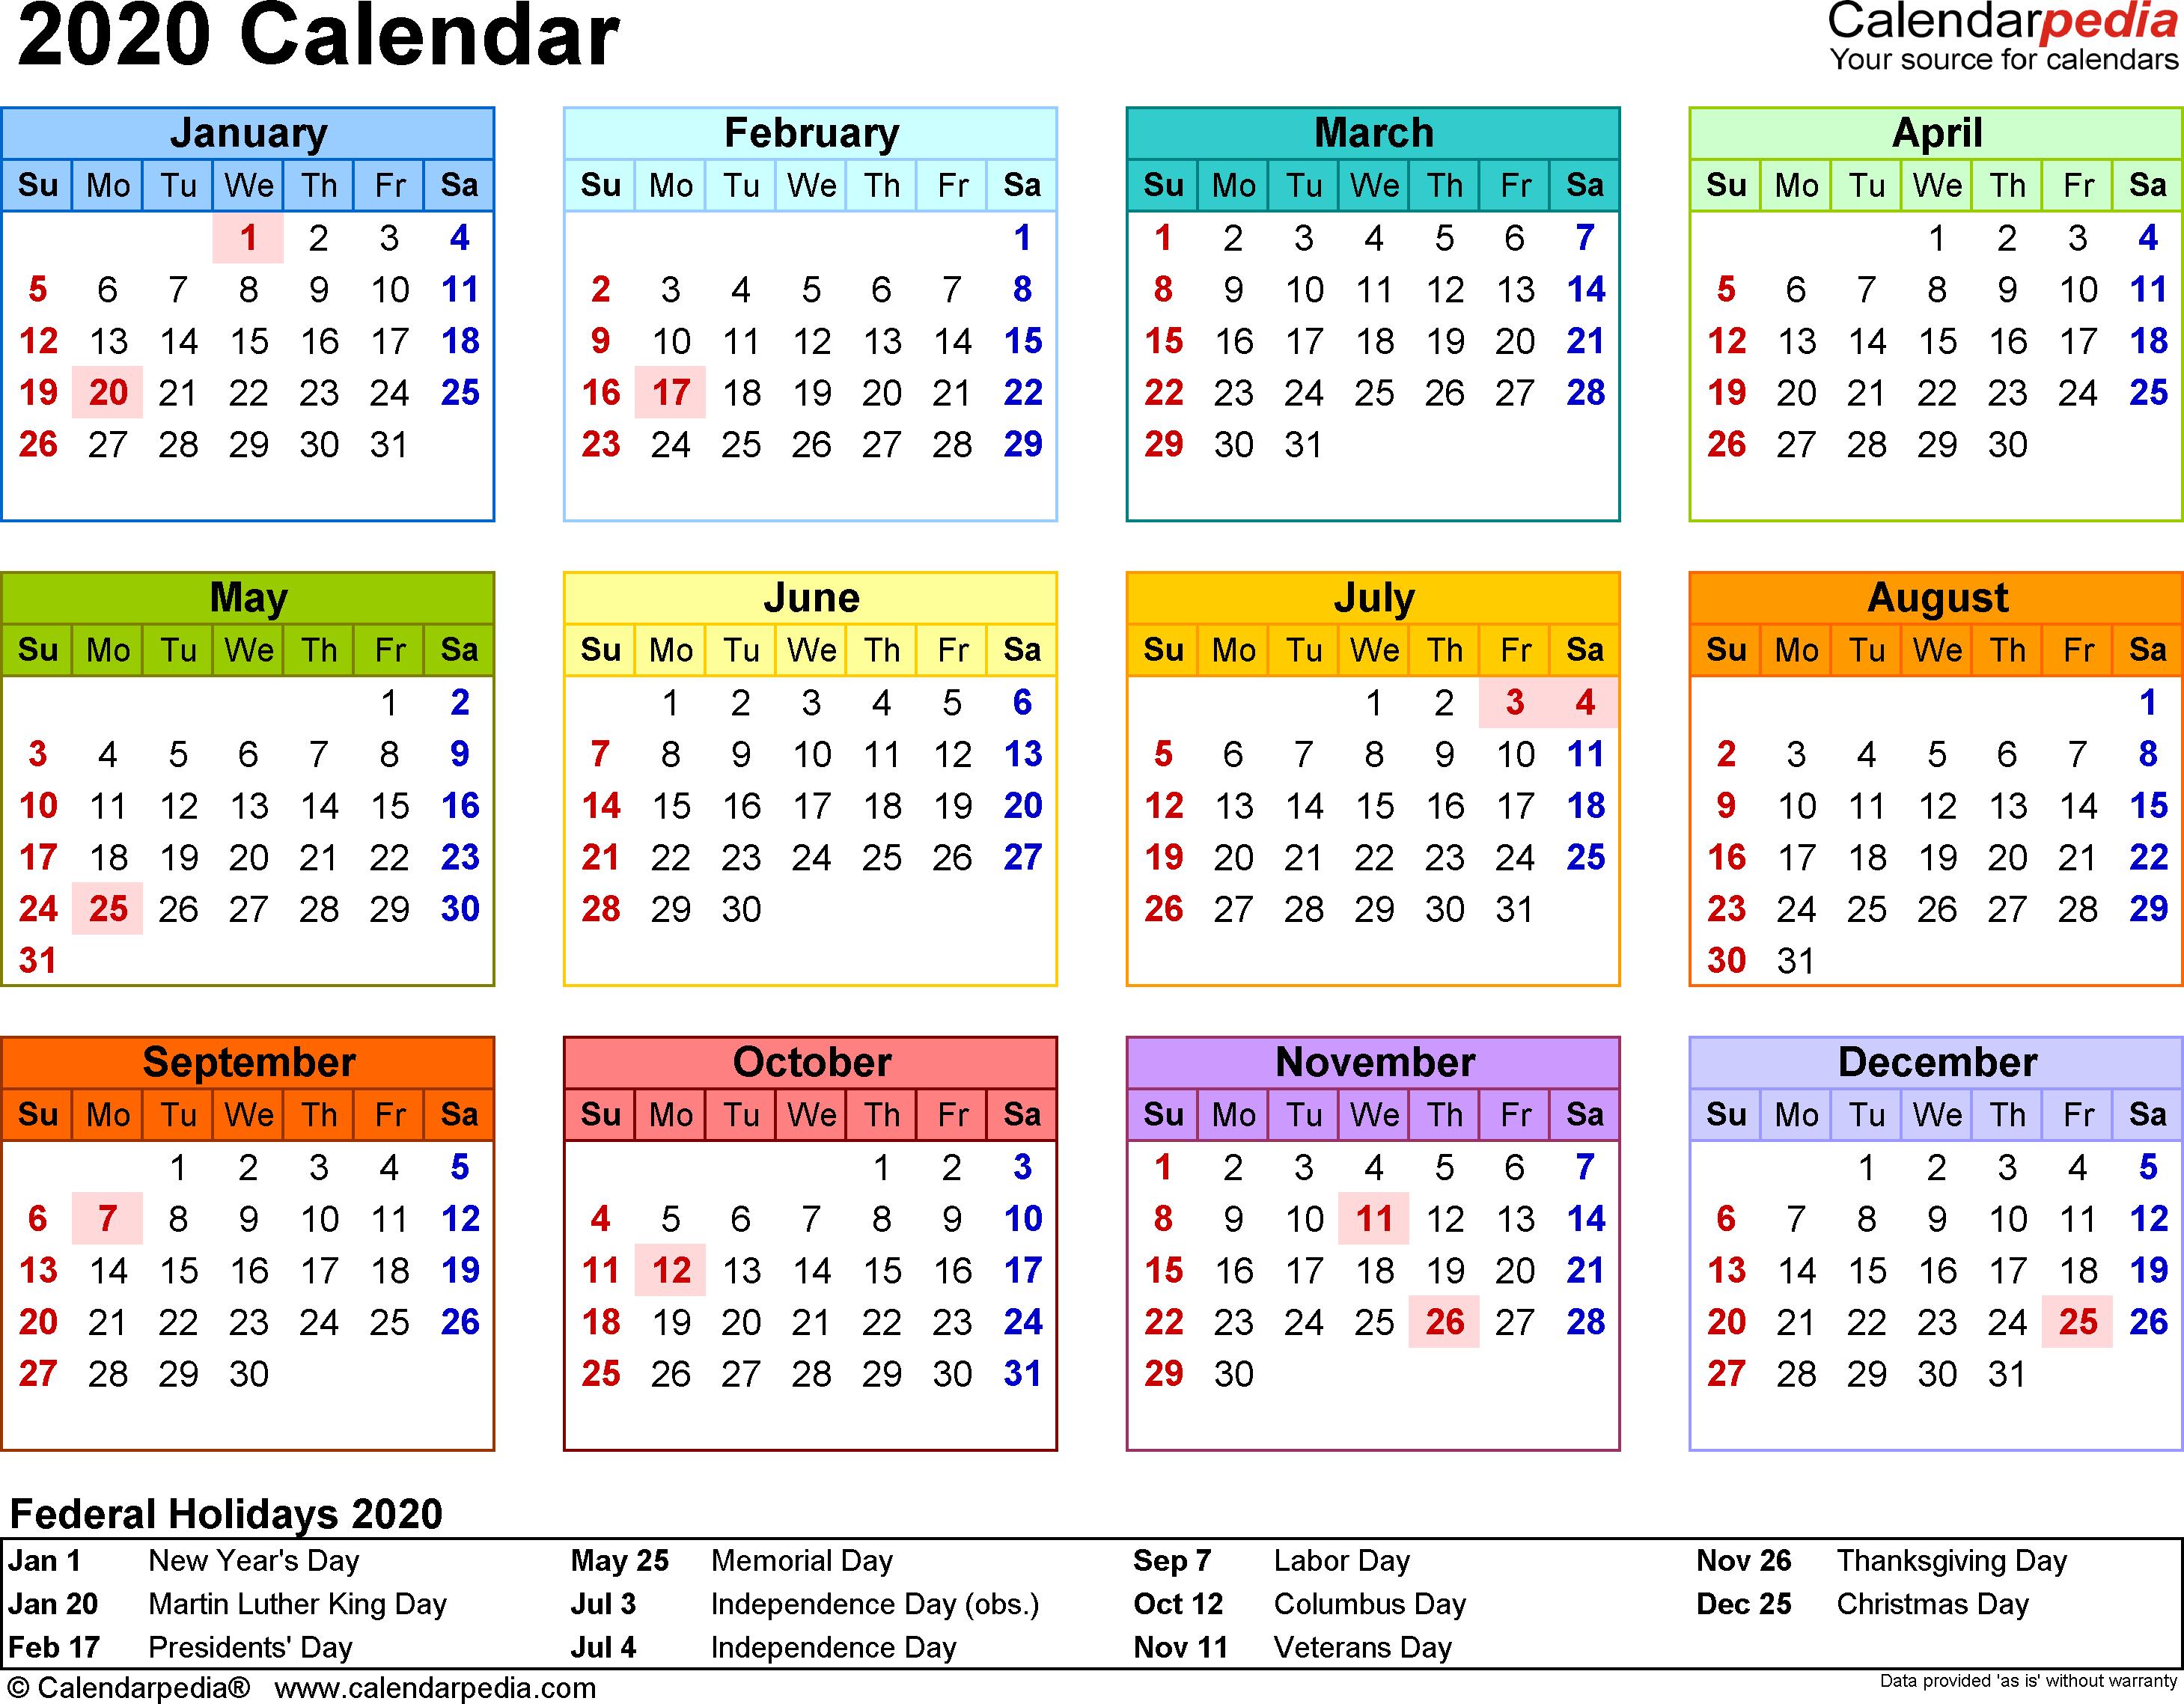 2020 Calendar Pdf - 17 Free Printable Calendar Templates pertaining to 2020 Calendar Printable Free Pdf